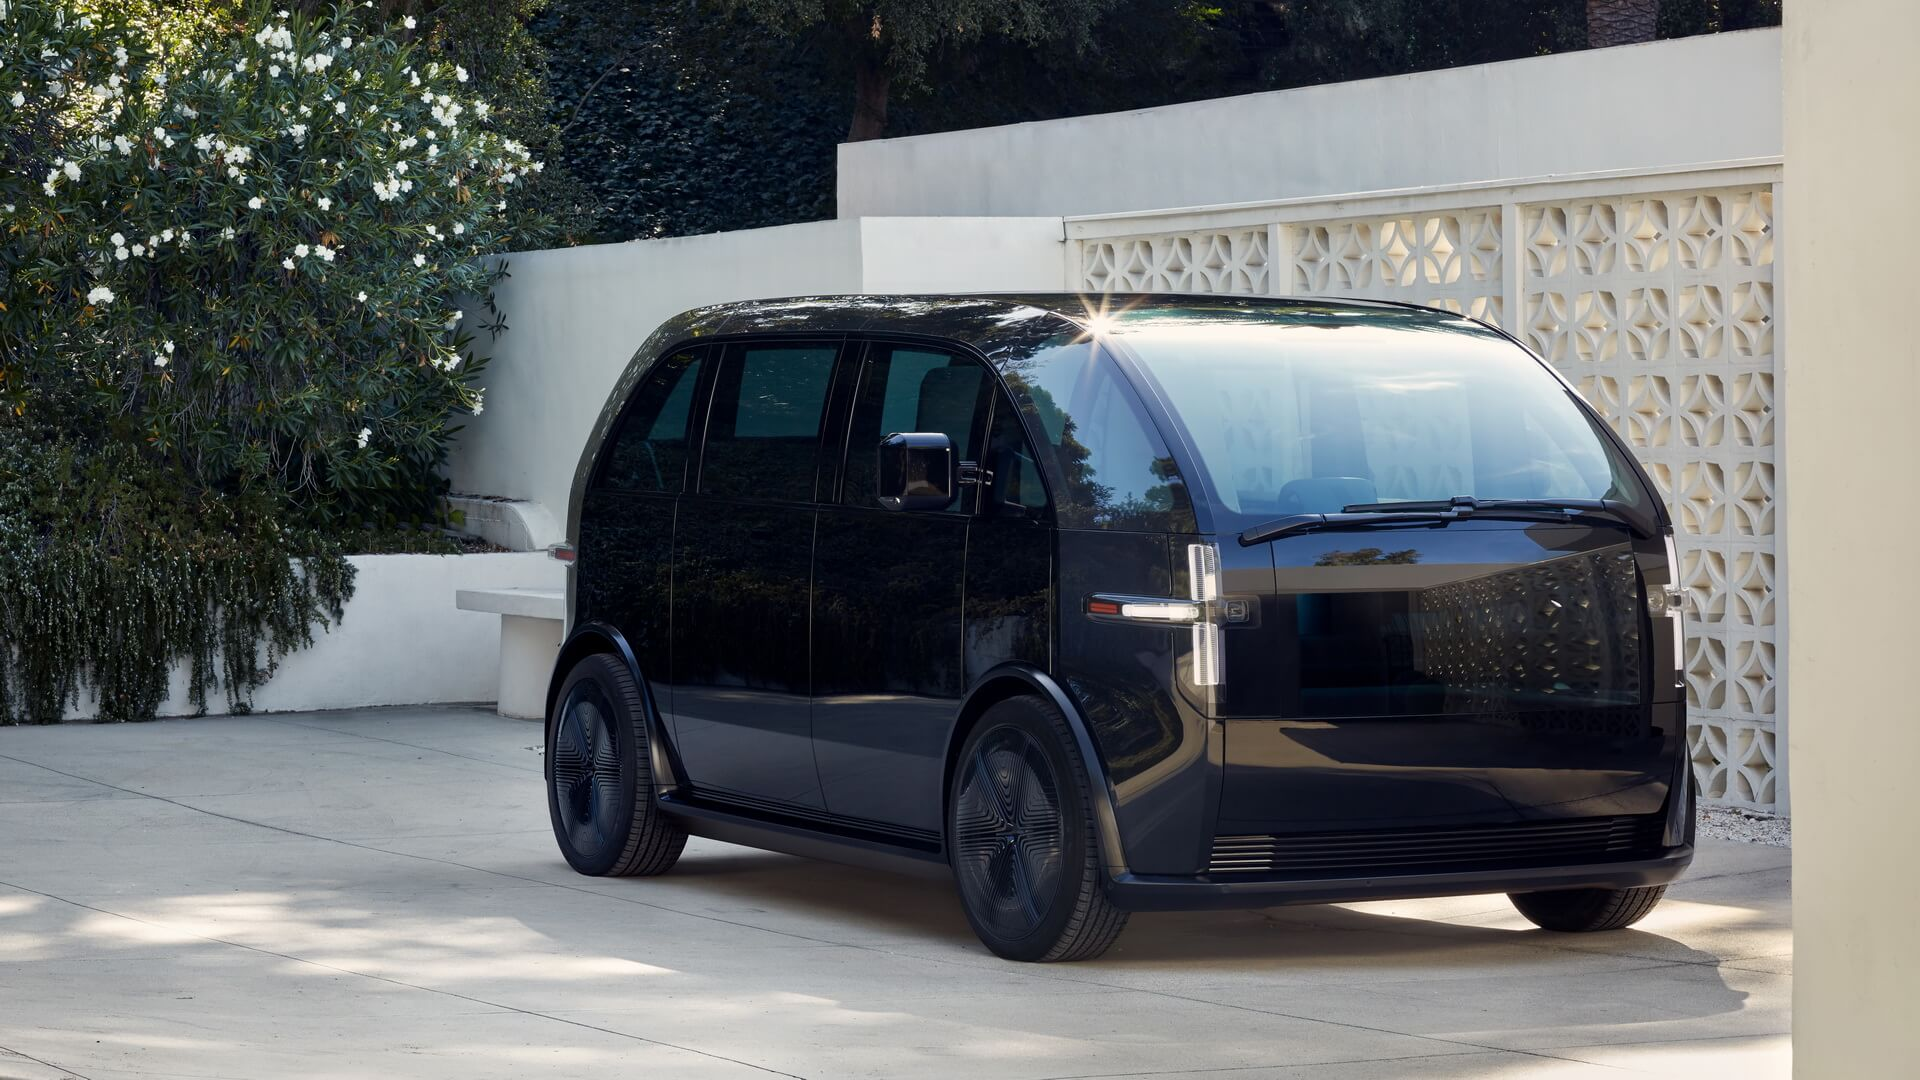 Стартап Canoo предложит электромобиль за абонплату